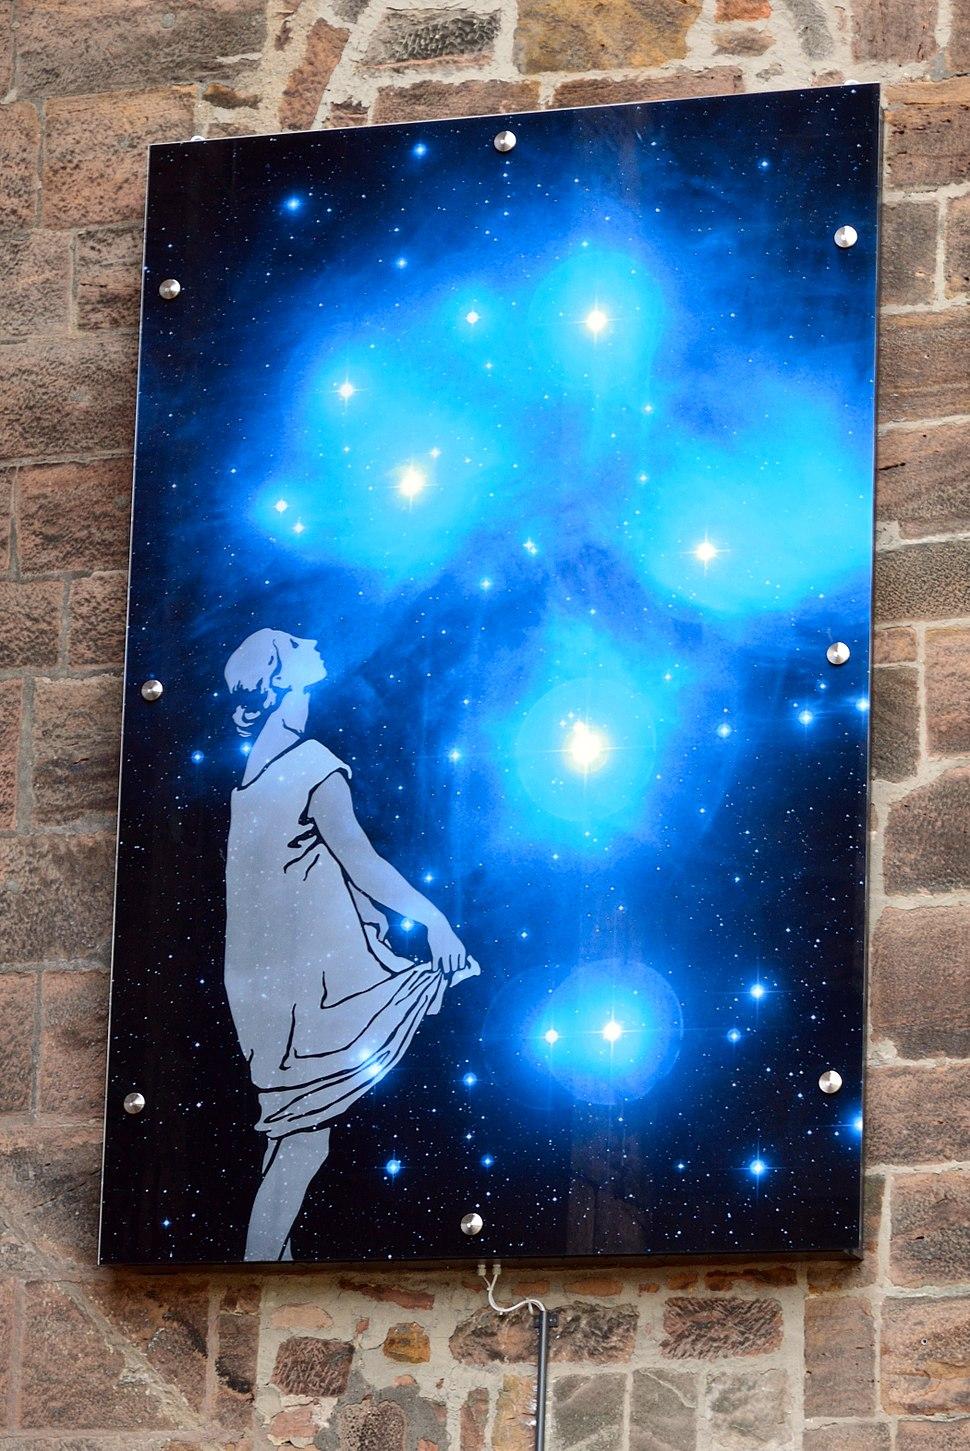 Sterntaler Universit%C3%A4tskirche Marburg 2